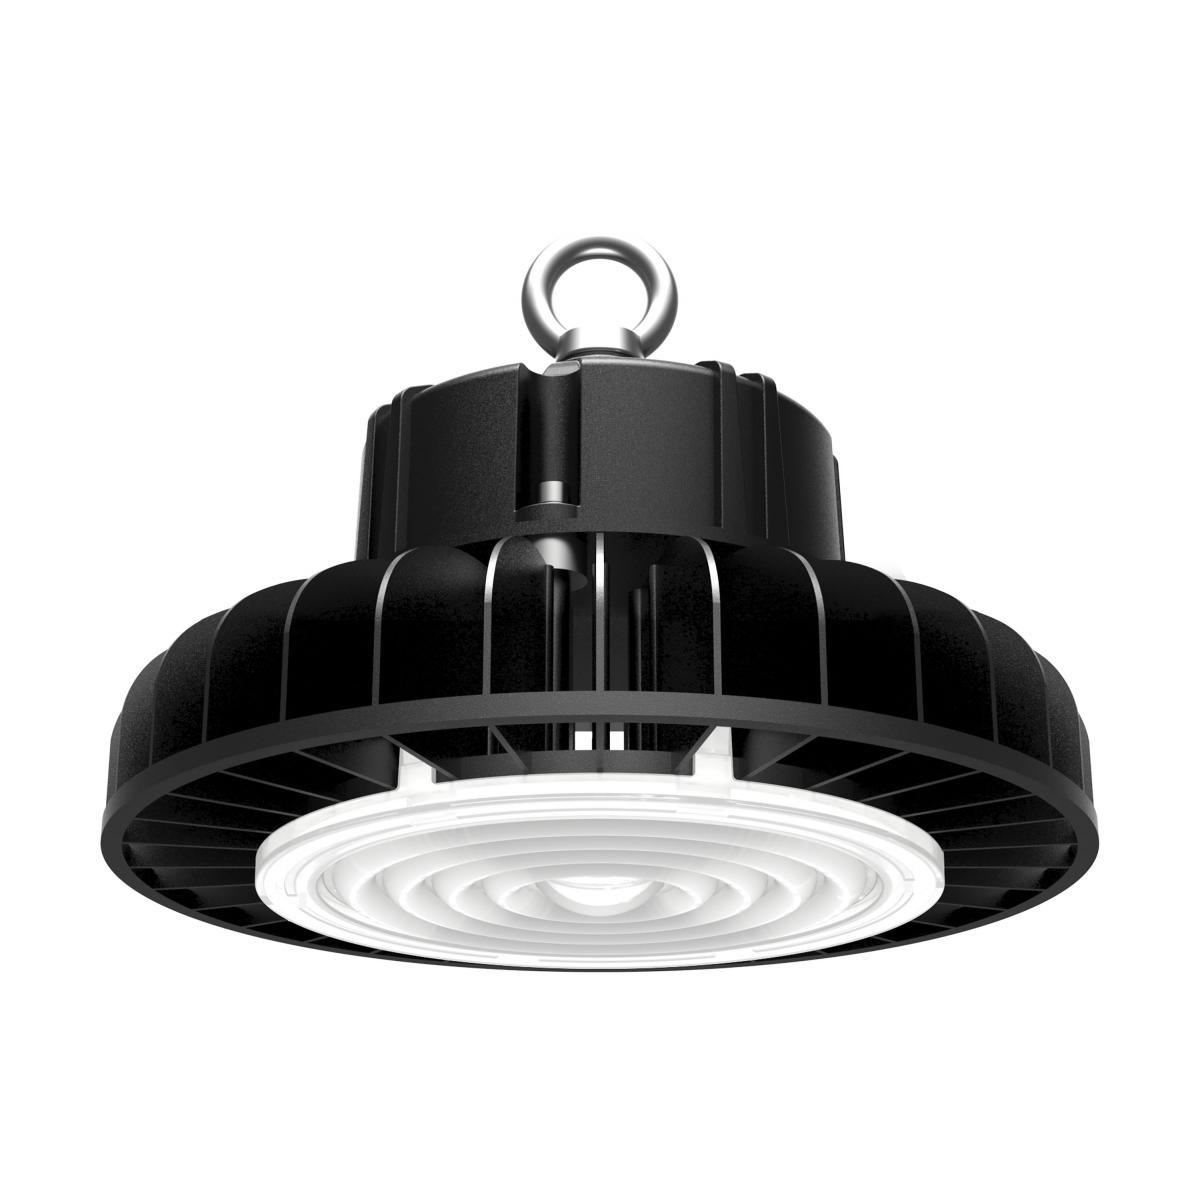 65-522 LED UFO HIGHBAY - 100W/5000K